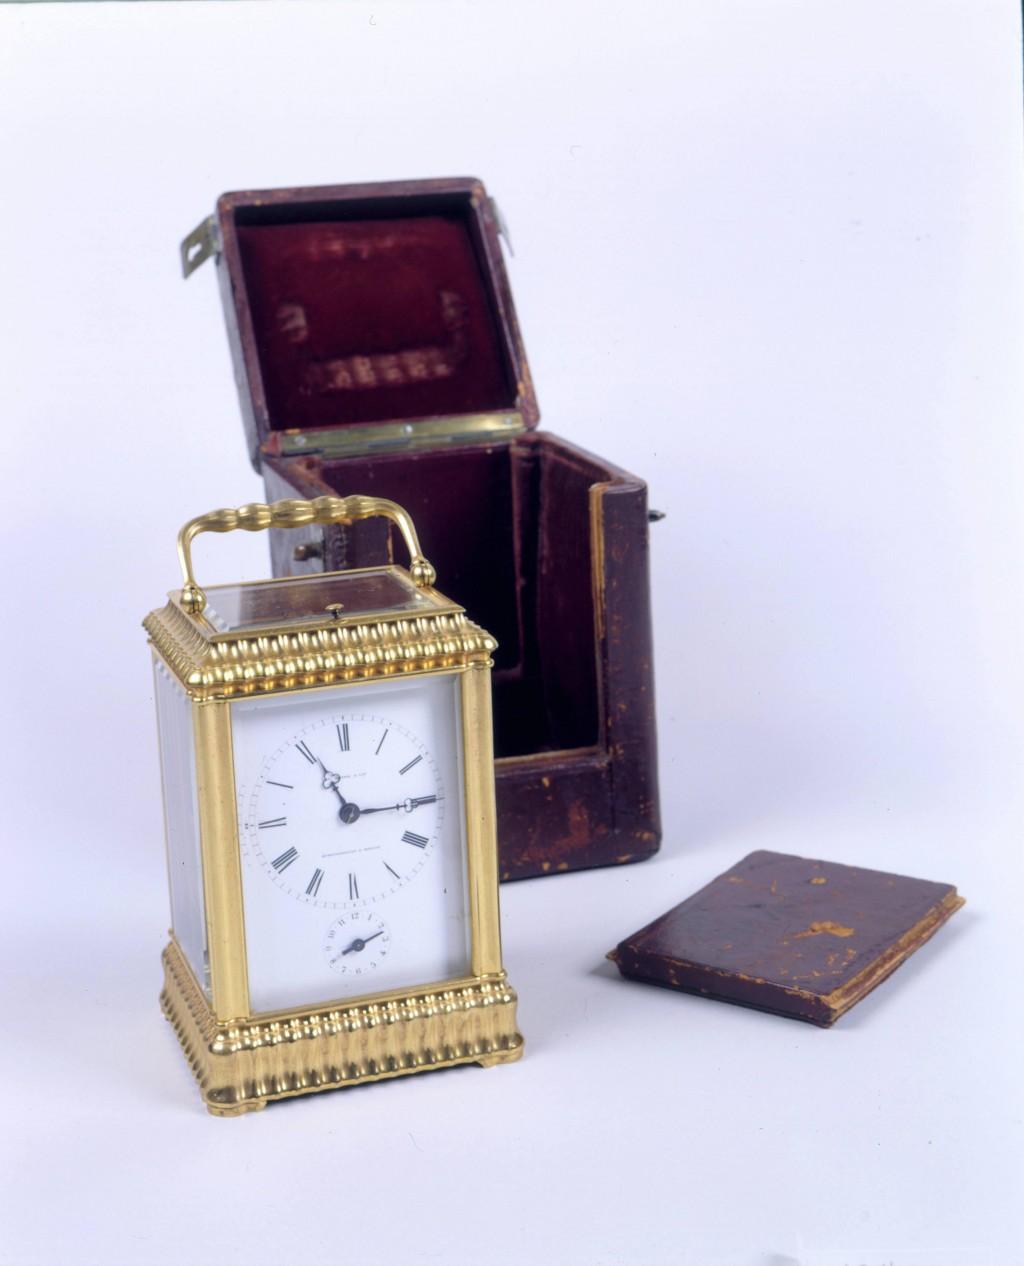 Travel Clock [LCID: 20053658]